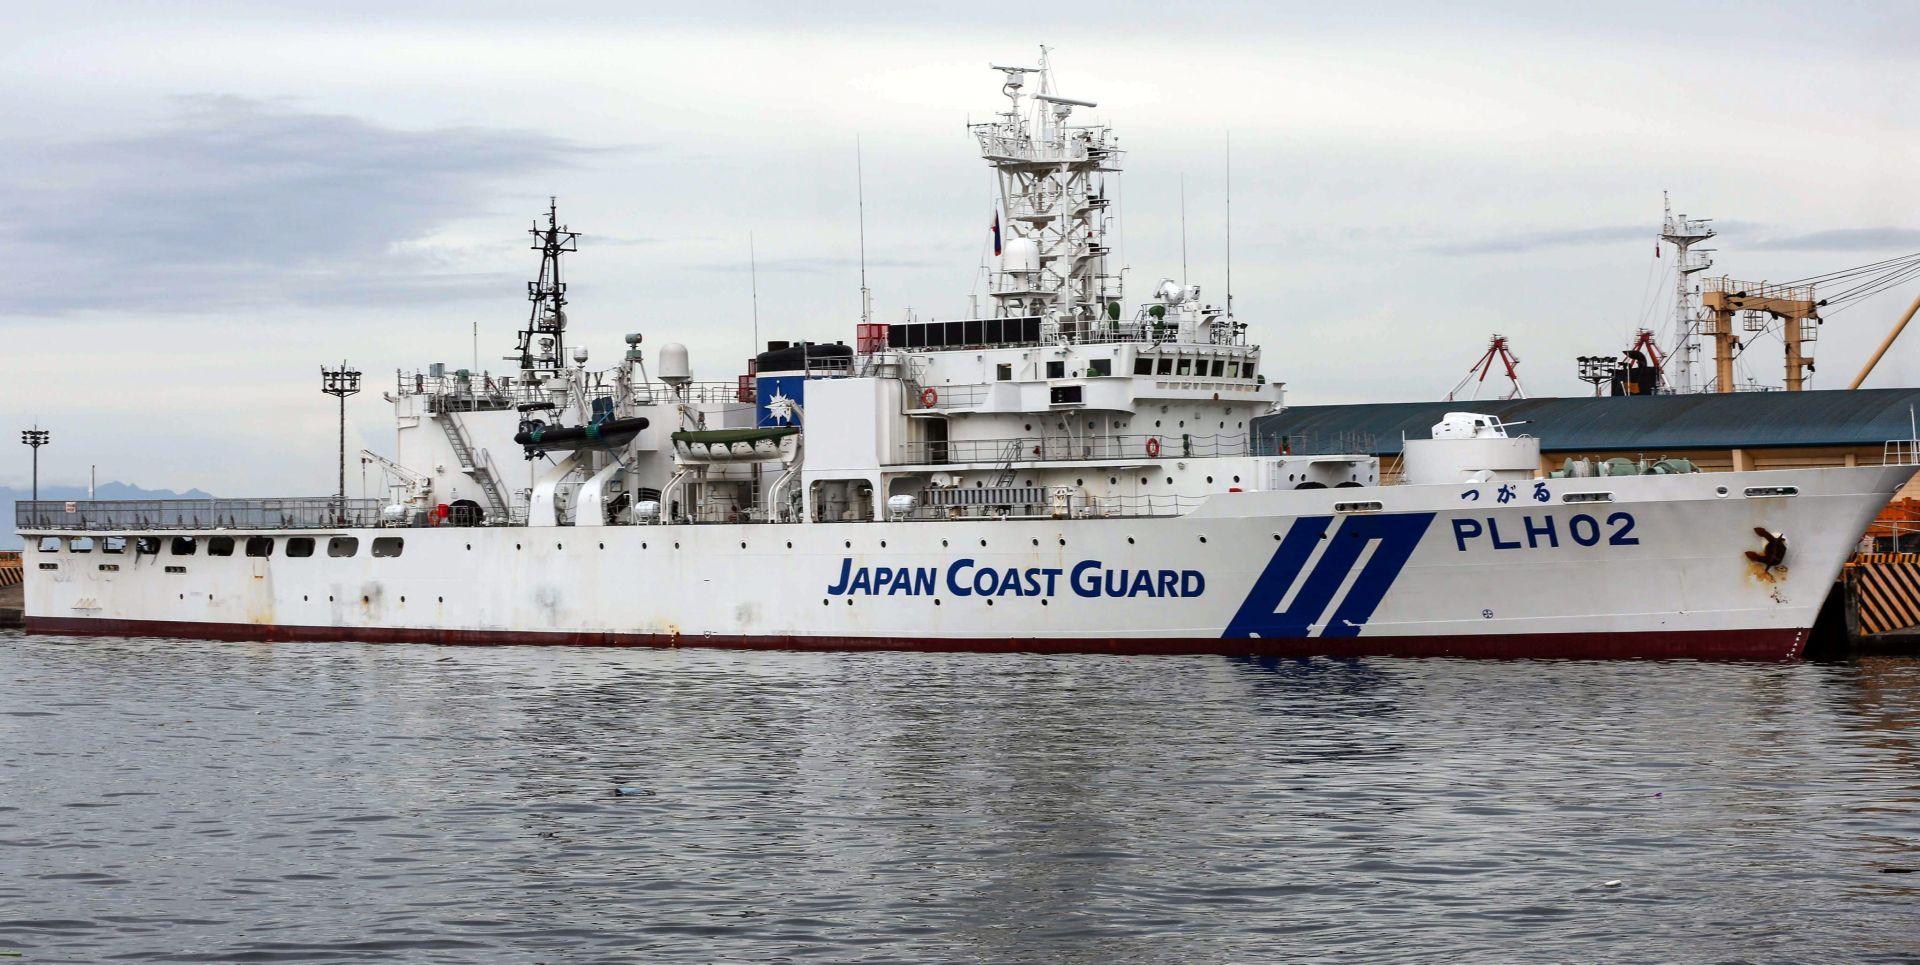 ISTOČNOKINESKO MORE: Kineska flota doplovila do japanskih otoka